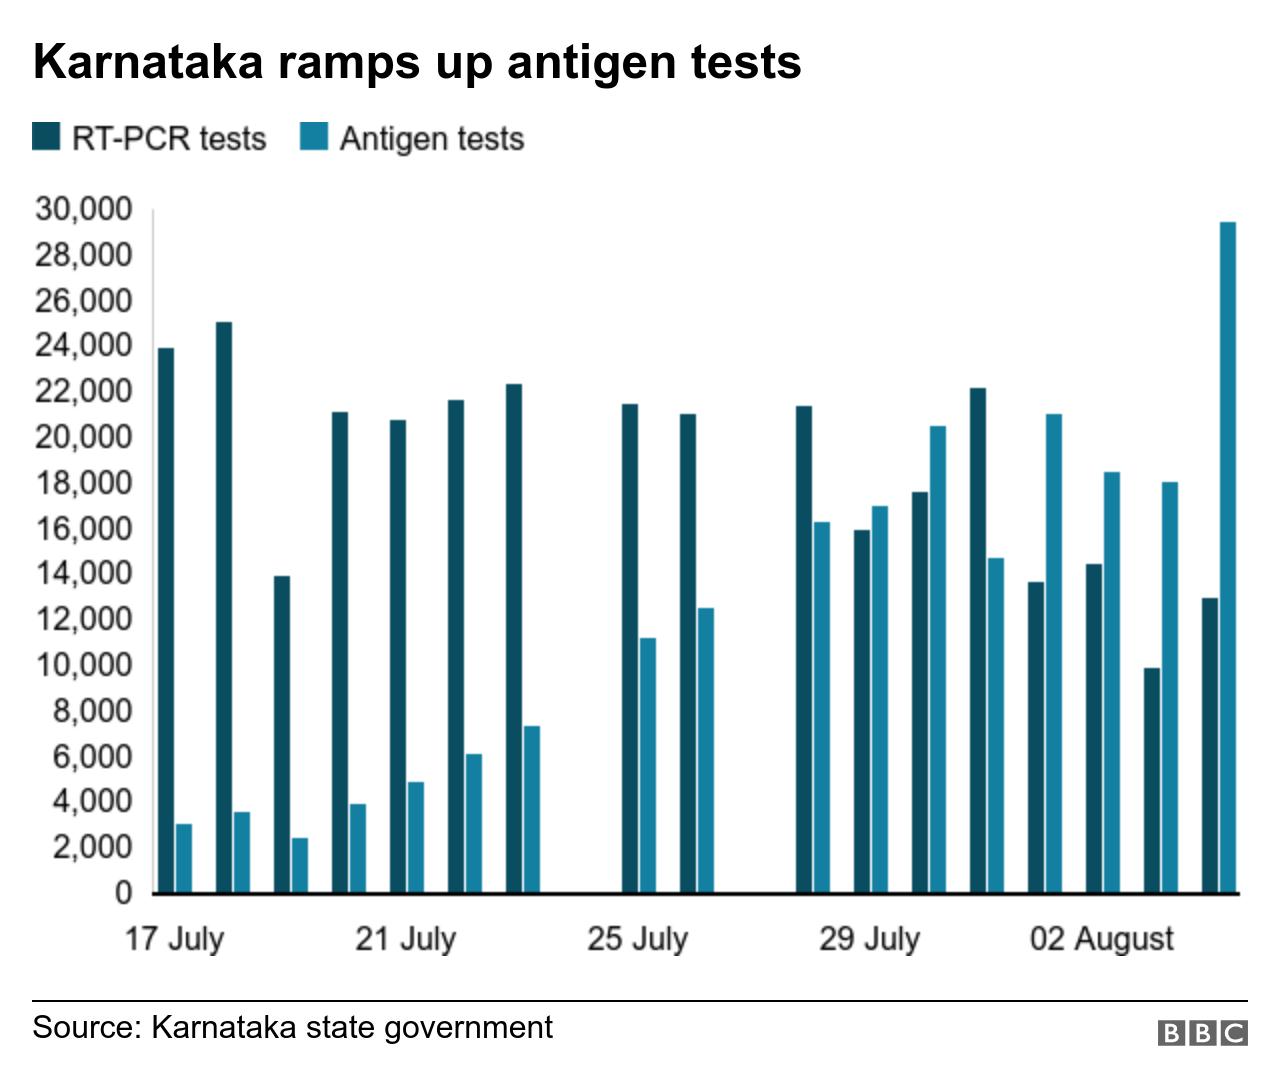 Chart showing PCR v antigen testing in Karnataka state